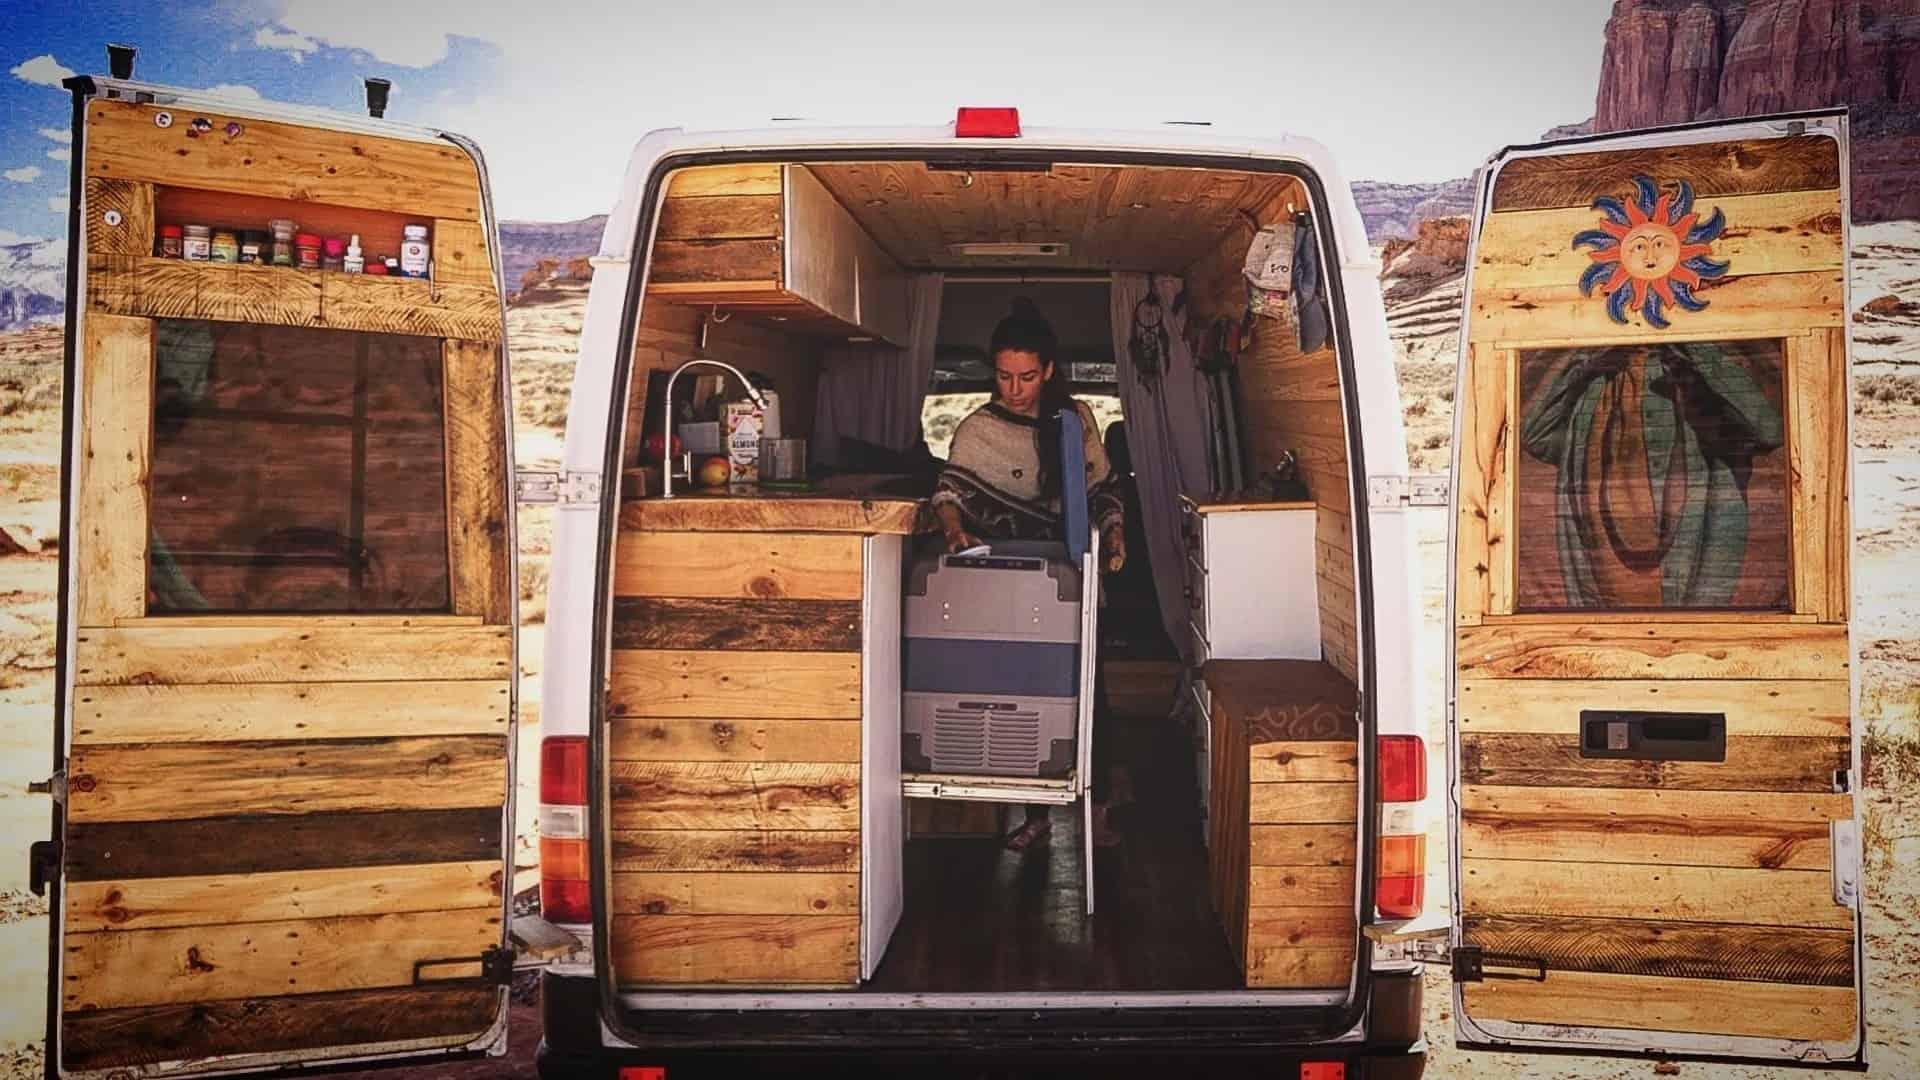 Como ser ecologico viviendo en furgoneta o RV 2